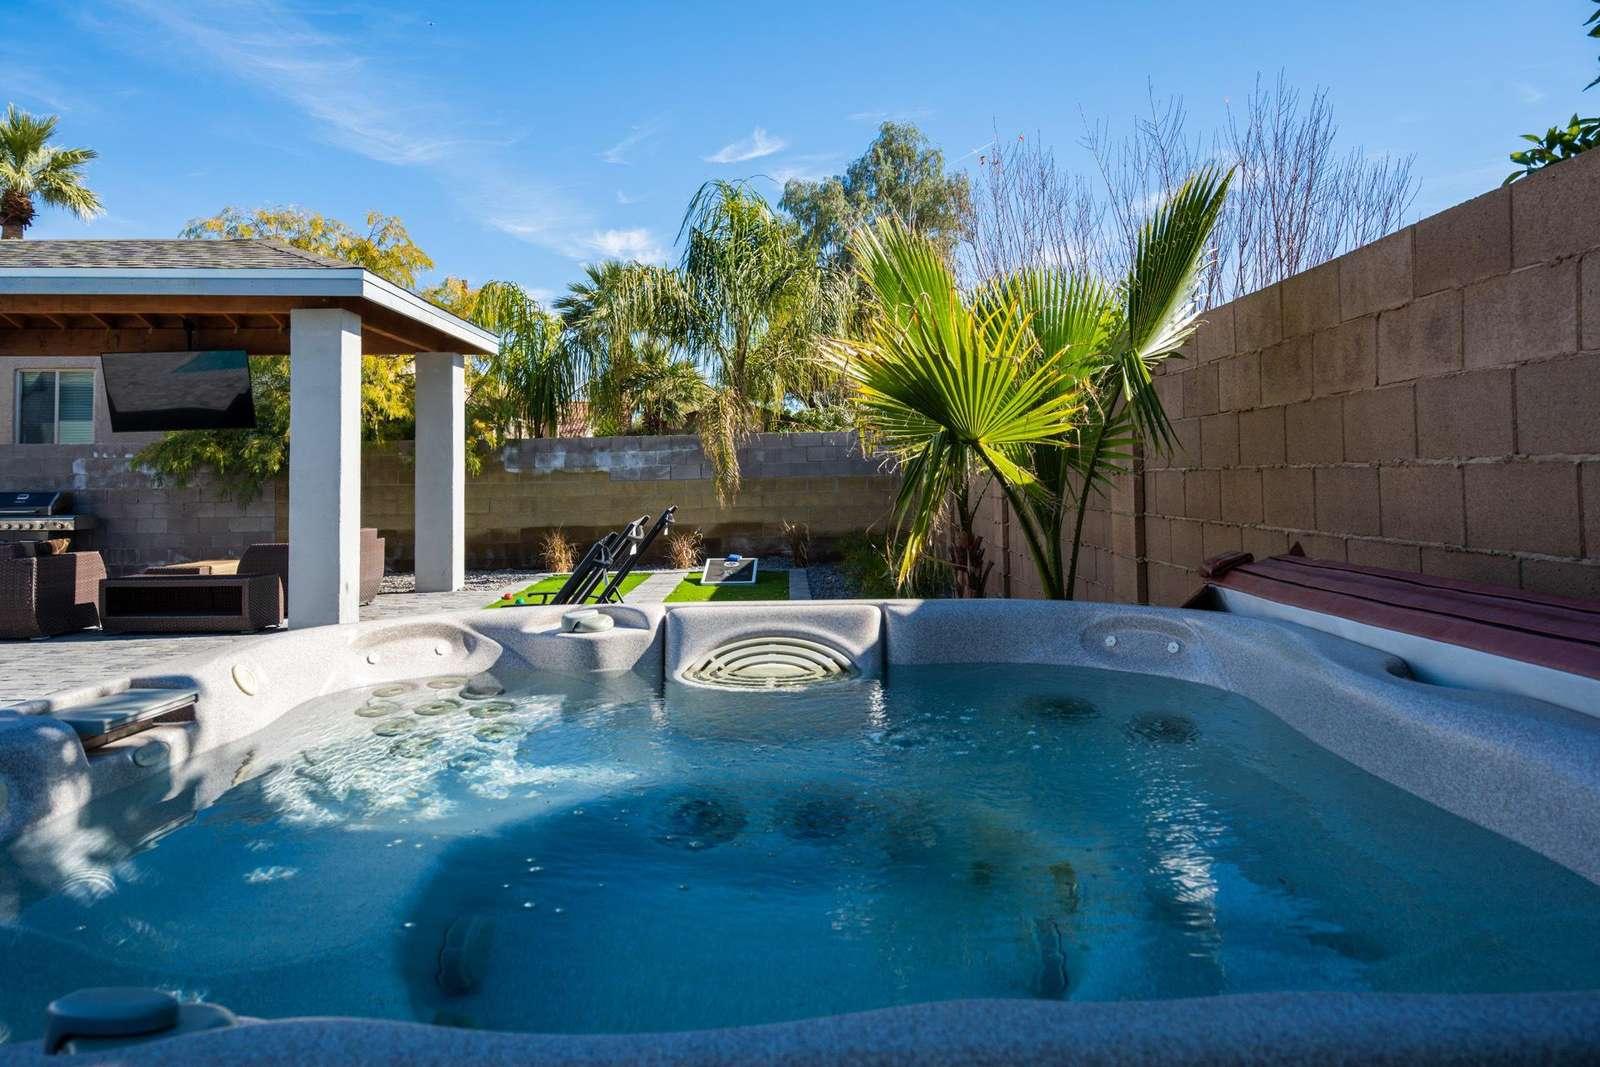 Full Size Hot Tub